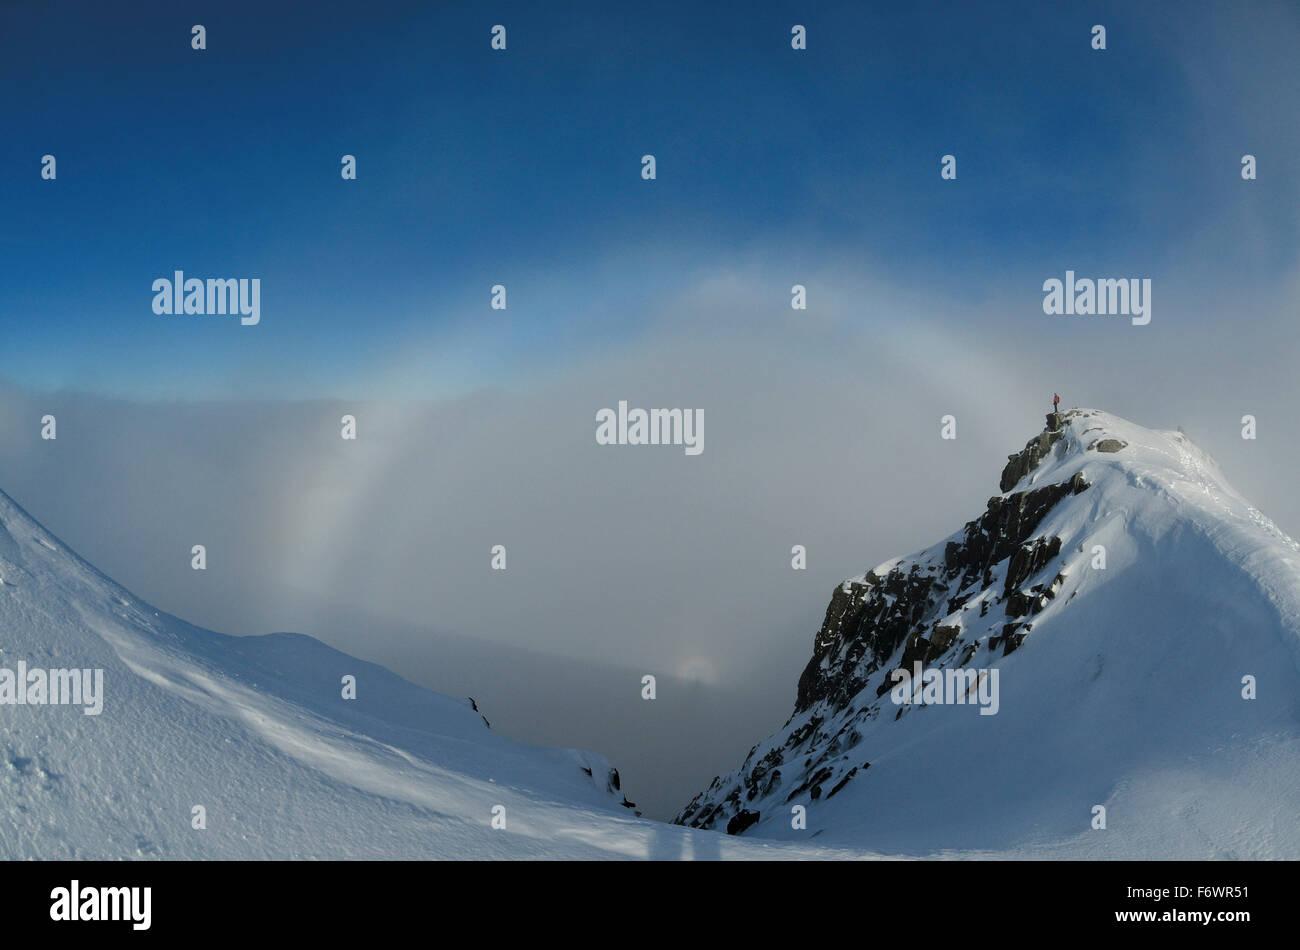 Halo, Ben Nevis, Grampian Mountains, Highlands, Scotland, Great Britain - Stock Image